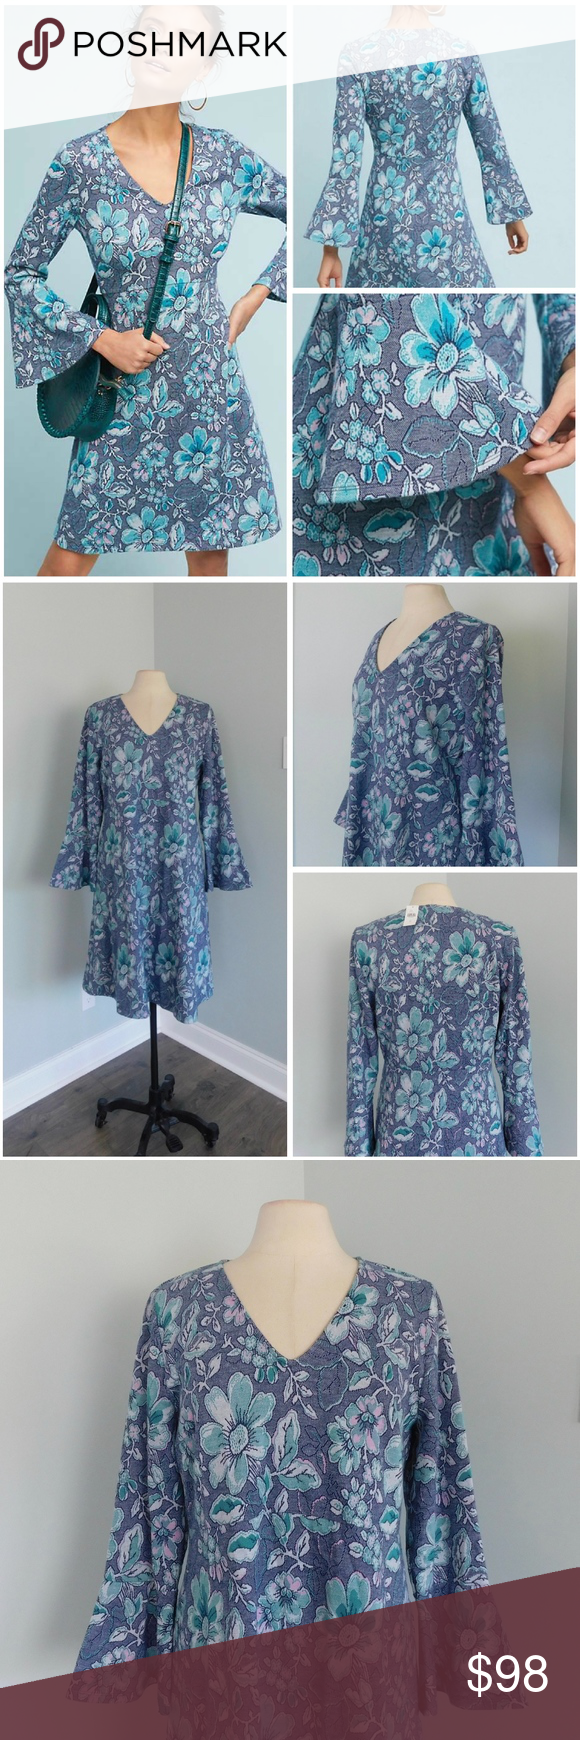 e11e29b8c71d NWT MAEVE X-Large Blue Floral FLORENCE Knit Dress *NO Trades Please* NWT